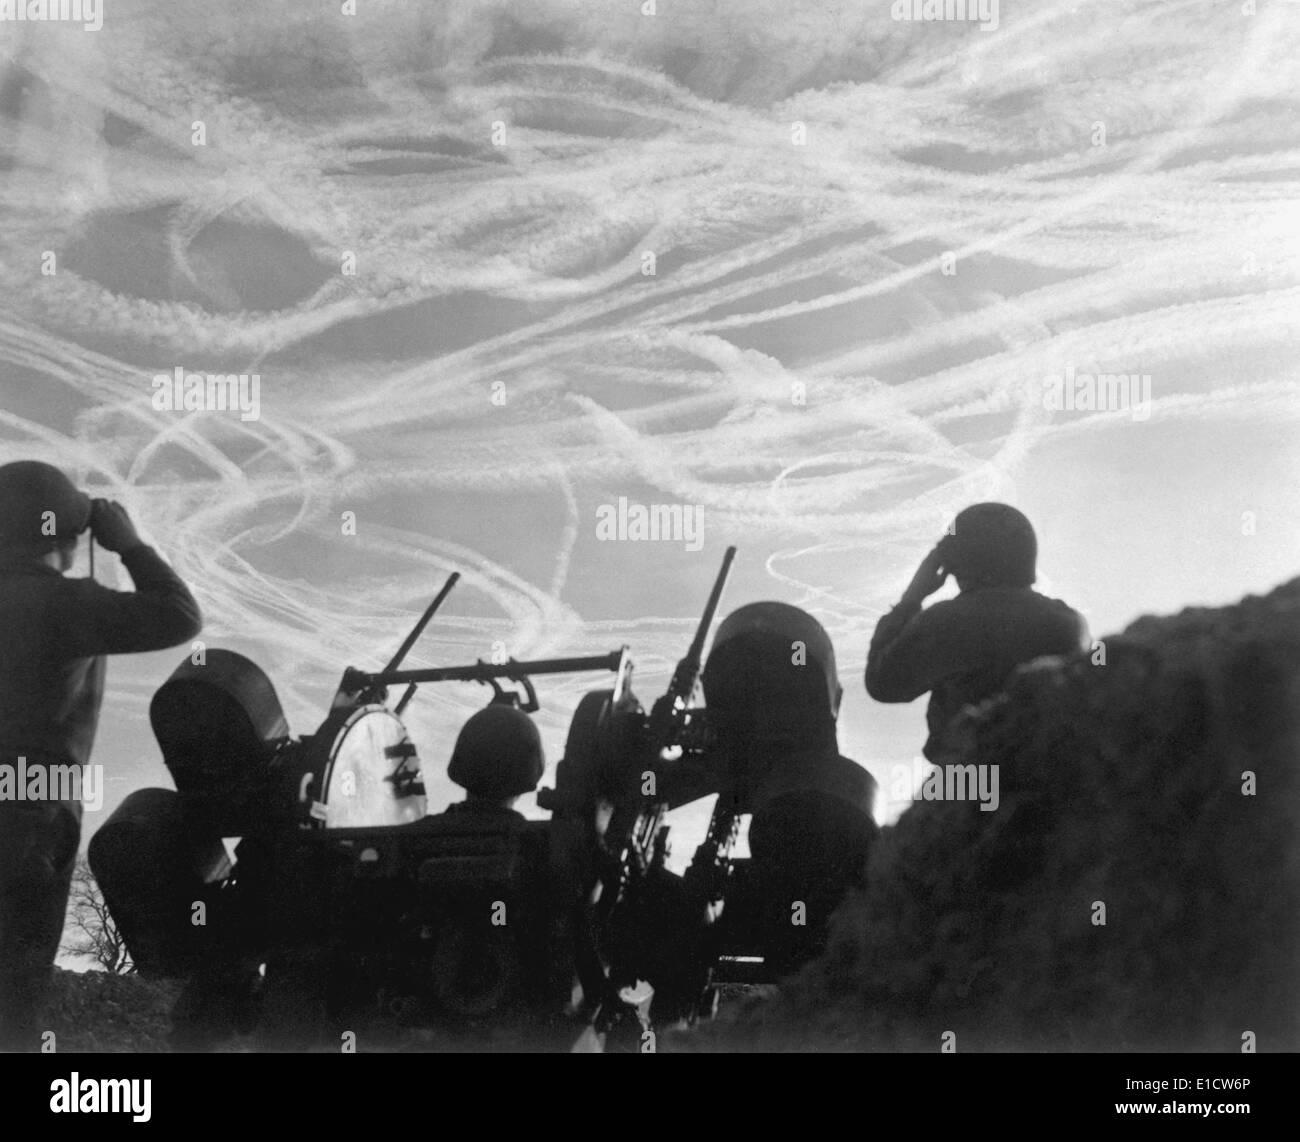 World War German Soldiers Christmas Stock Photos & World War German ...